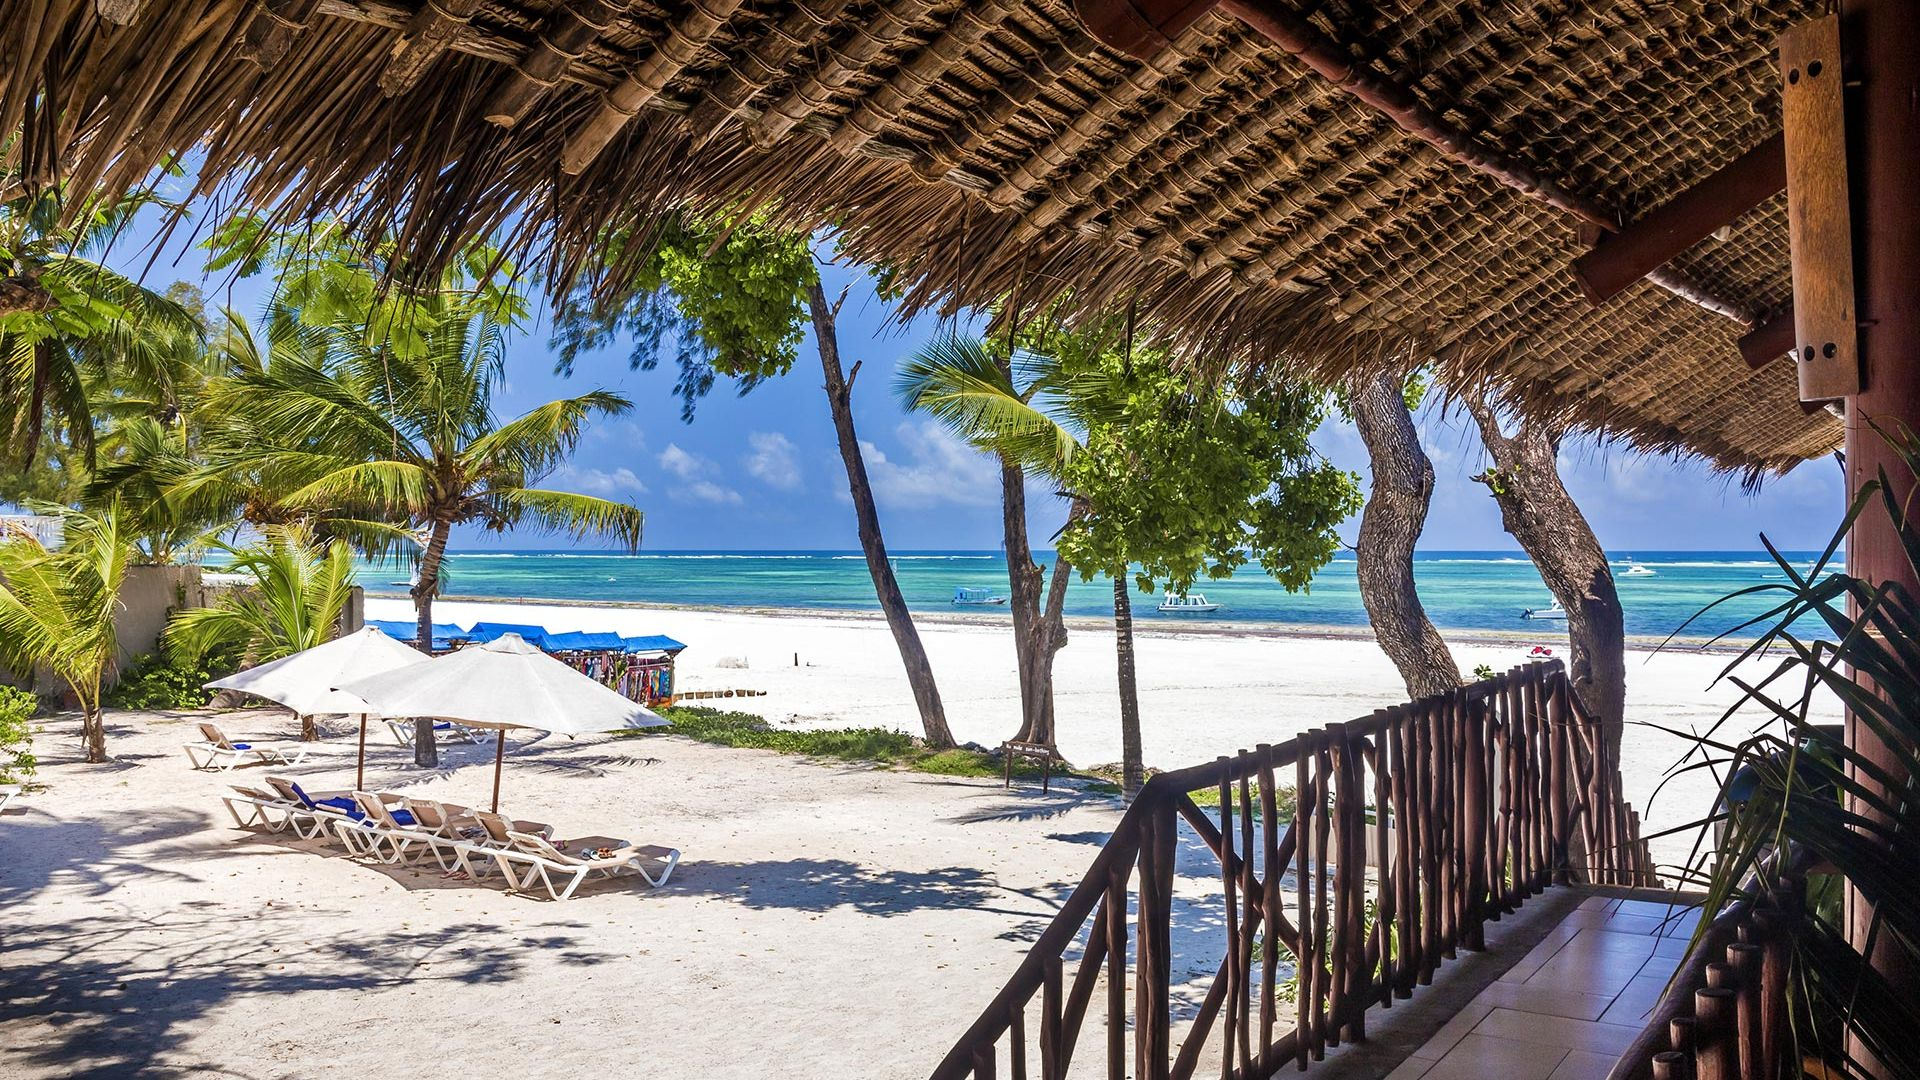 Sejur charter Diani Beach, Kenya, 9 zile - februarie 2022